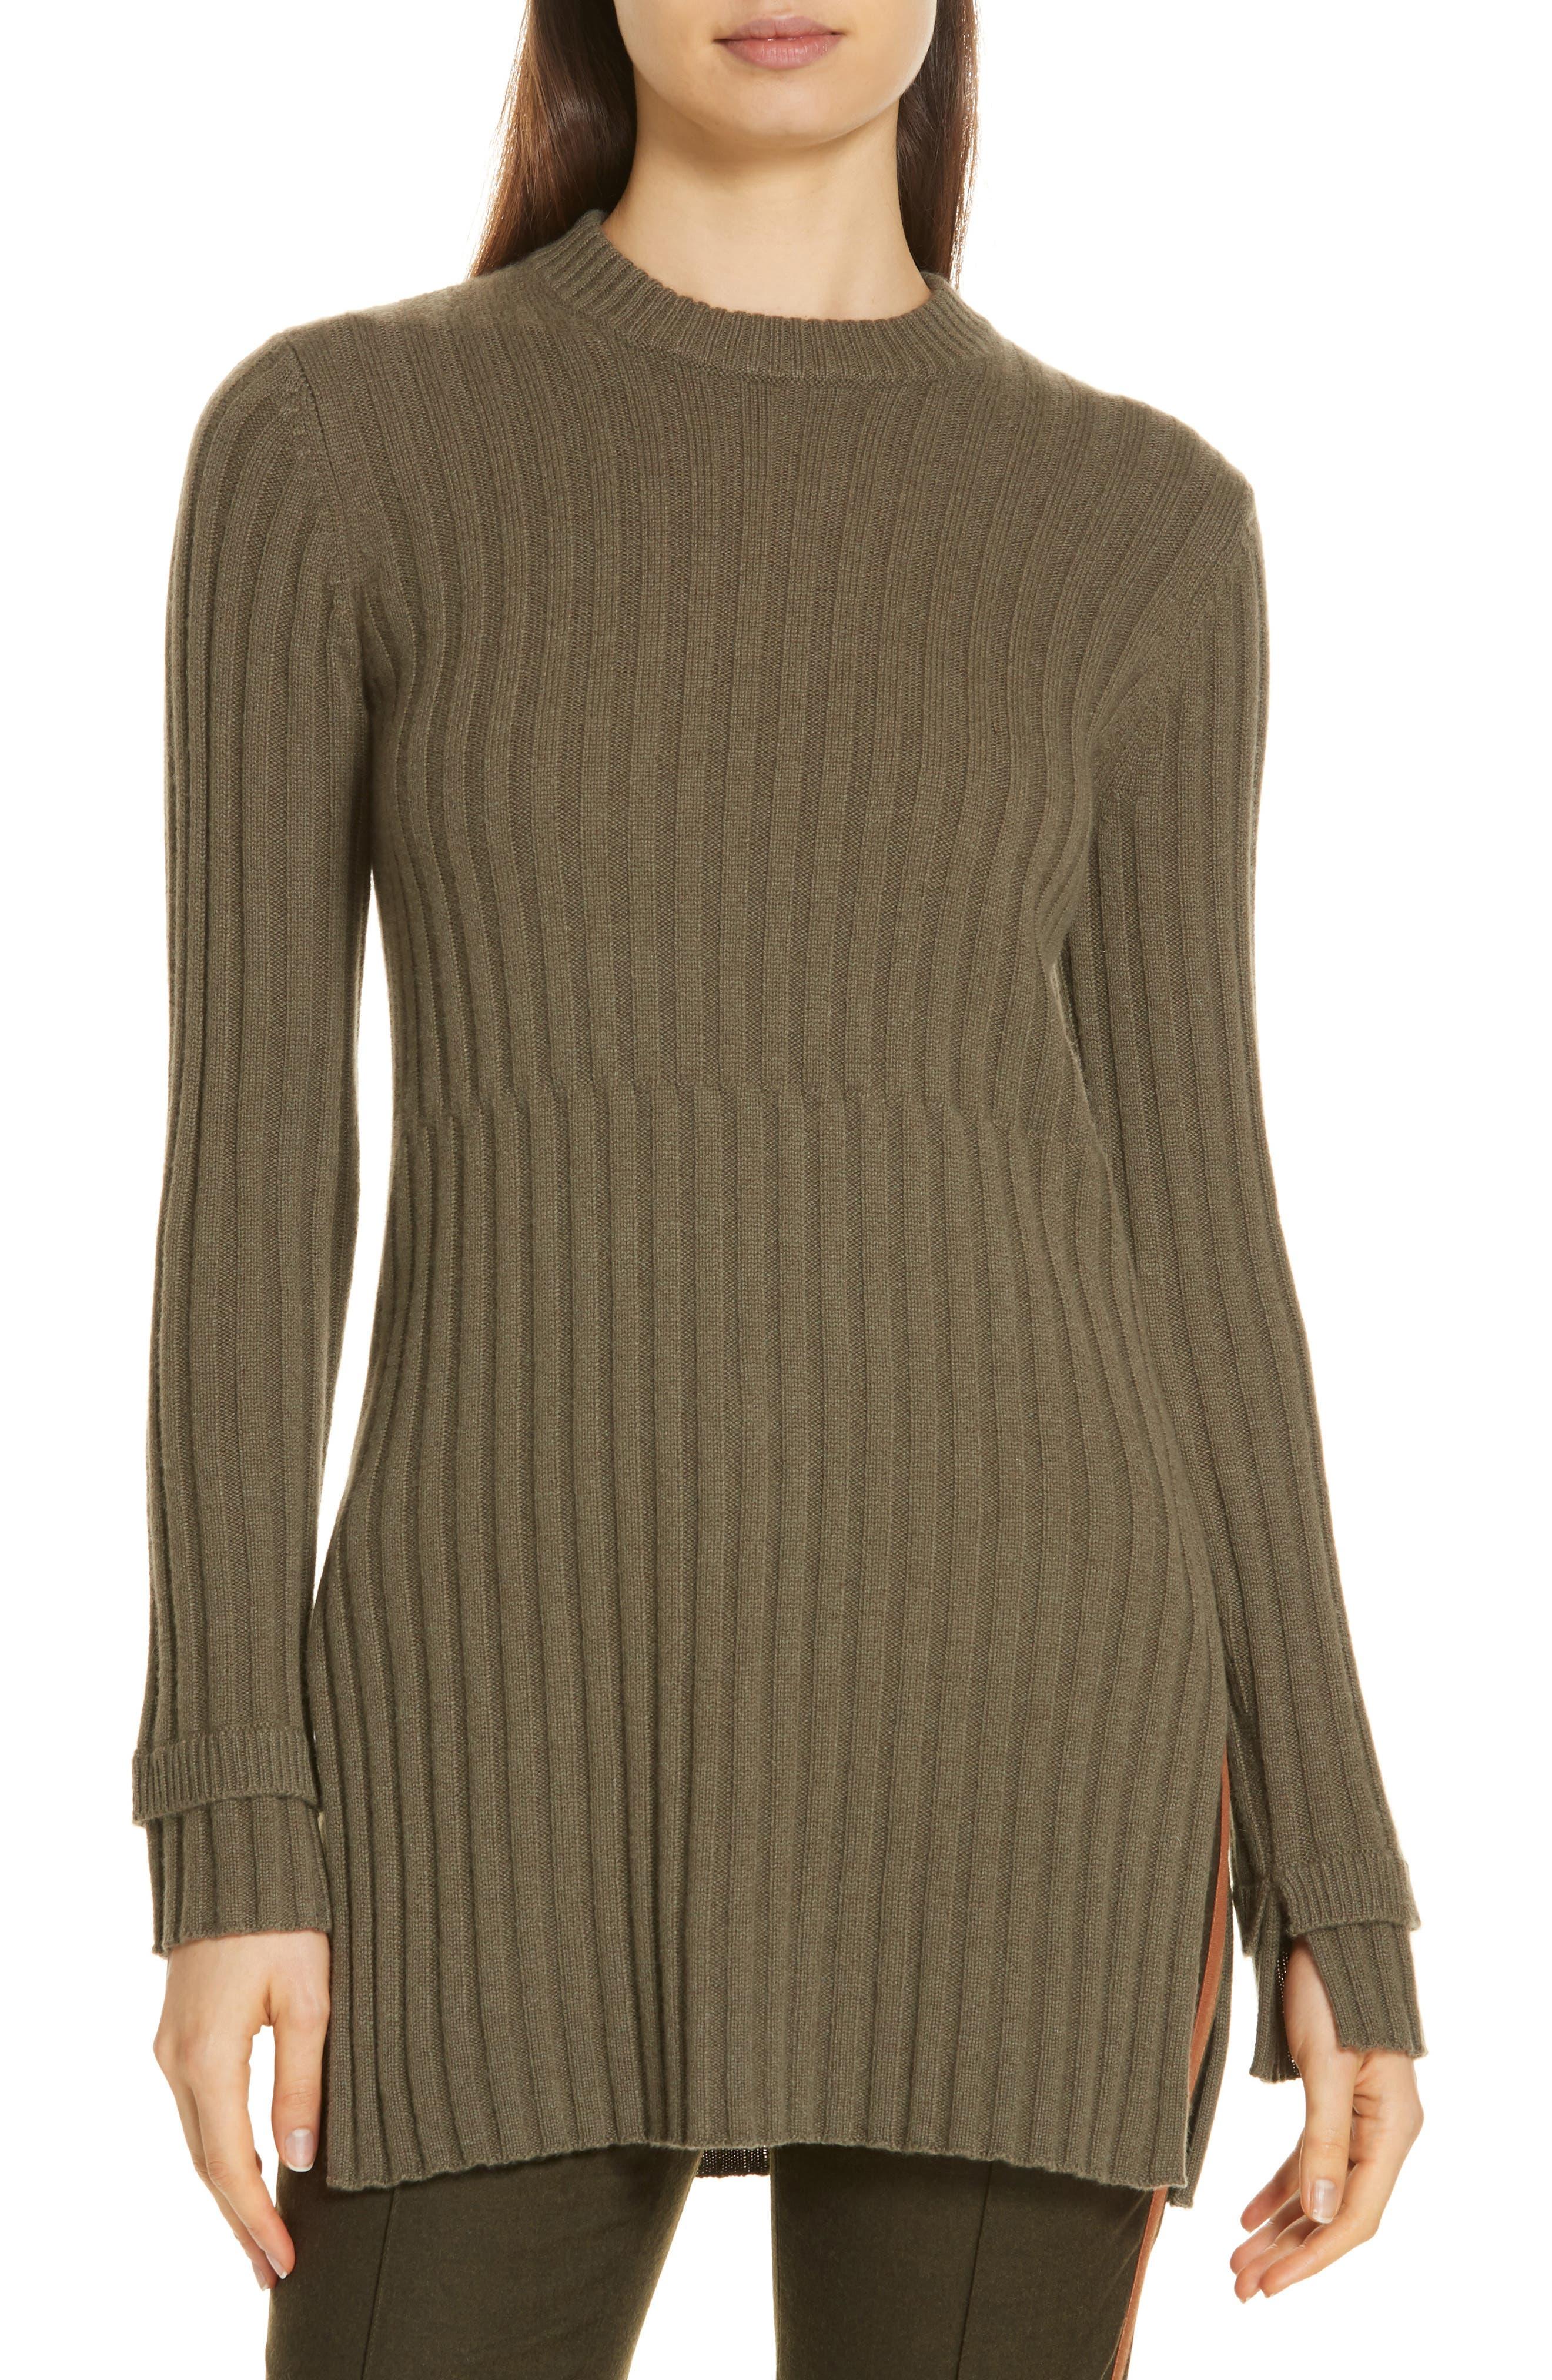 Rib Knit Cashmere Tunic,                             Main thumbnail 1, color,                             OLIVE IVY HEATHER